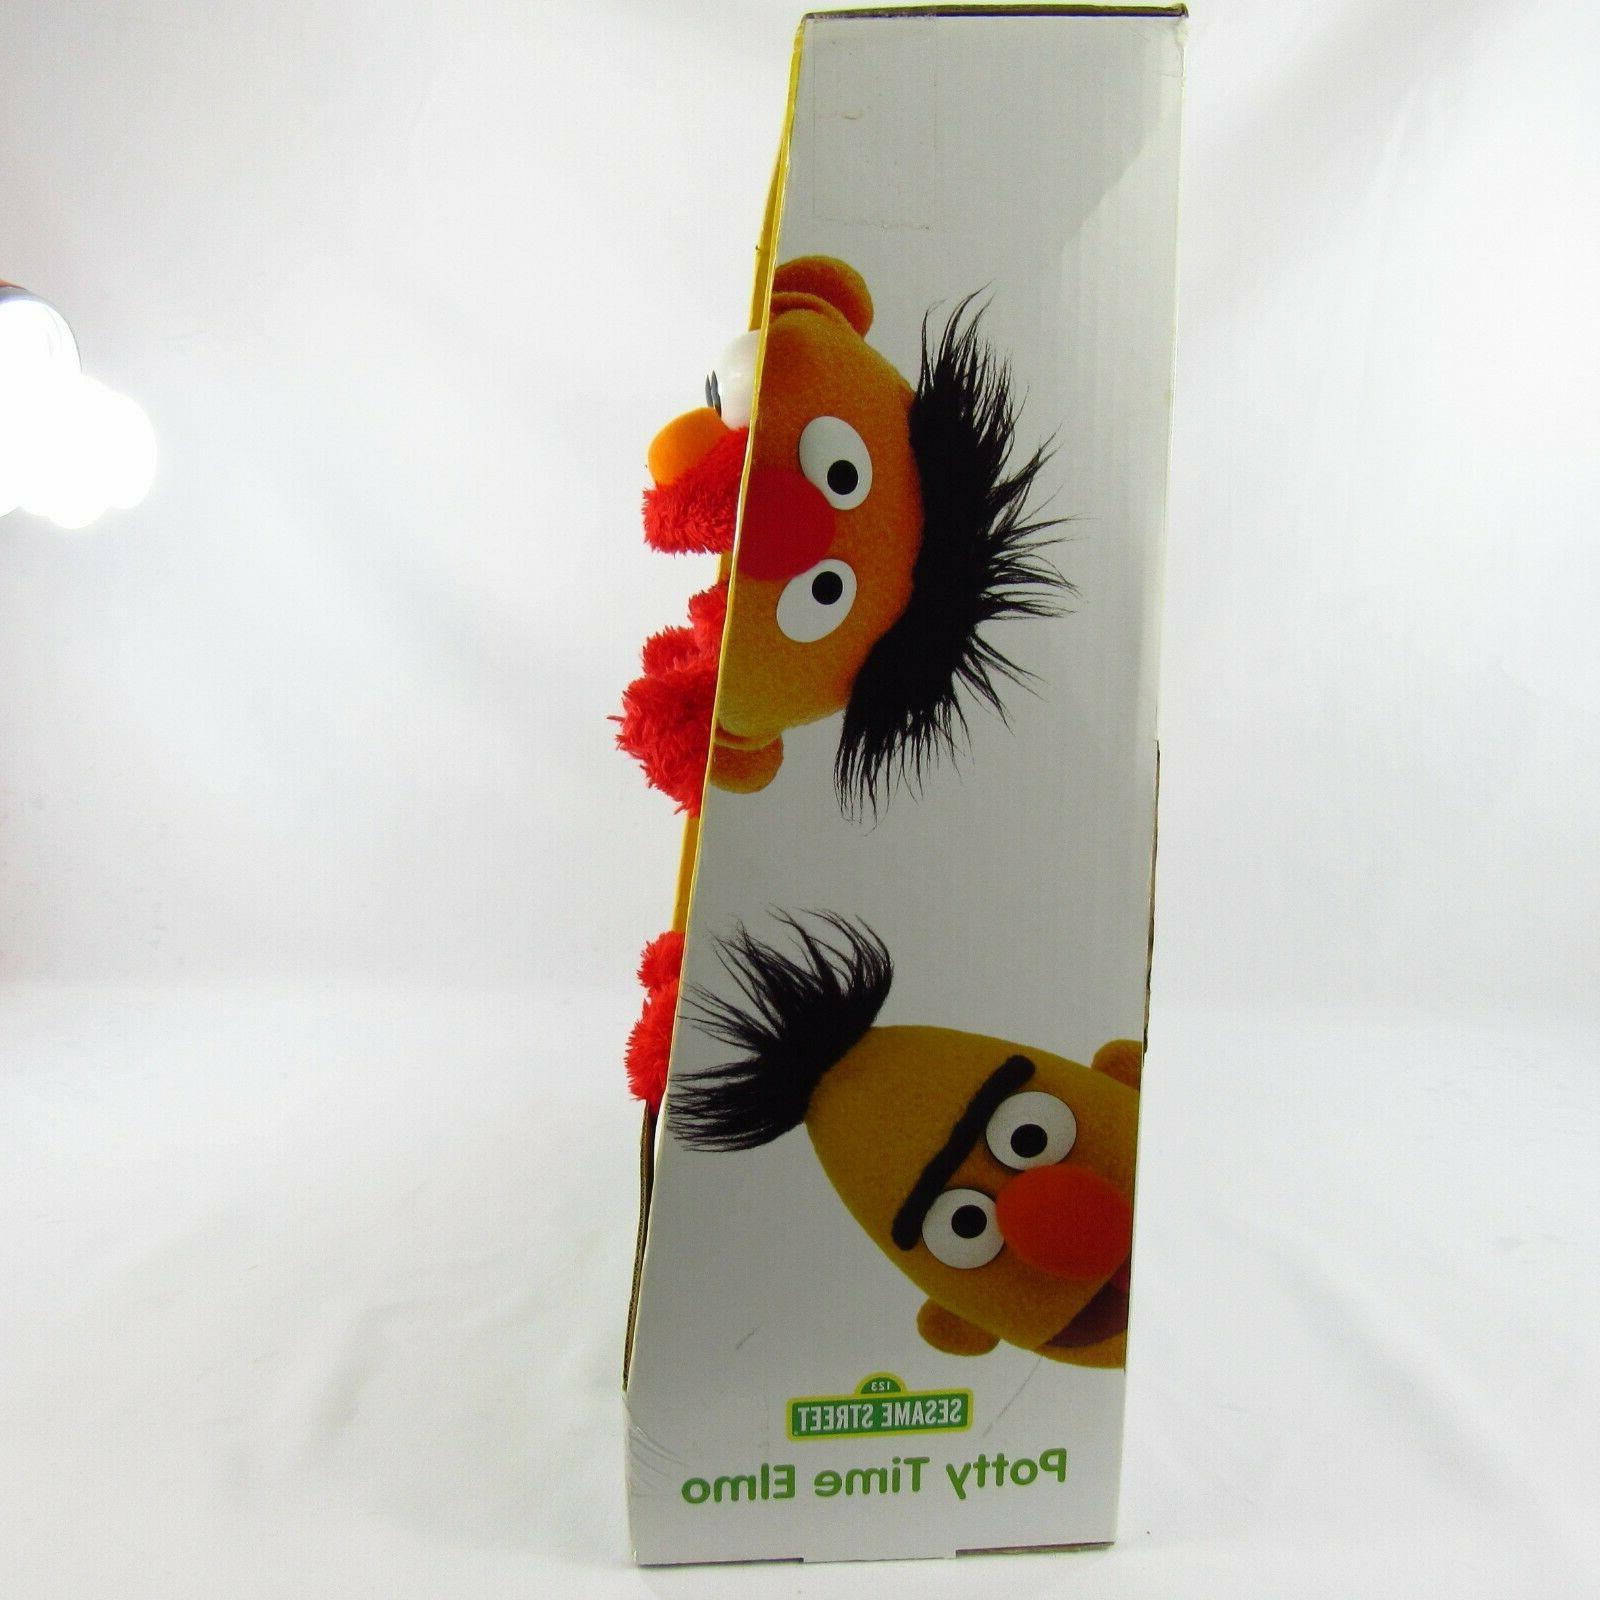 Hasbro Potty Time Toddler Toilet Training Toy NIB